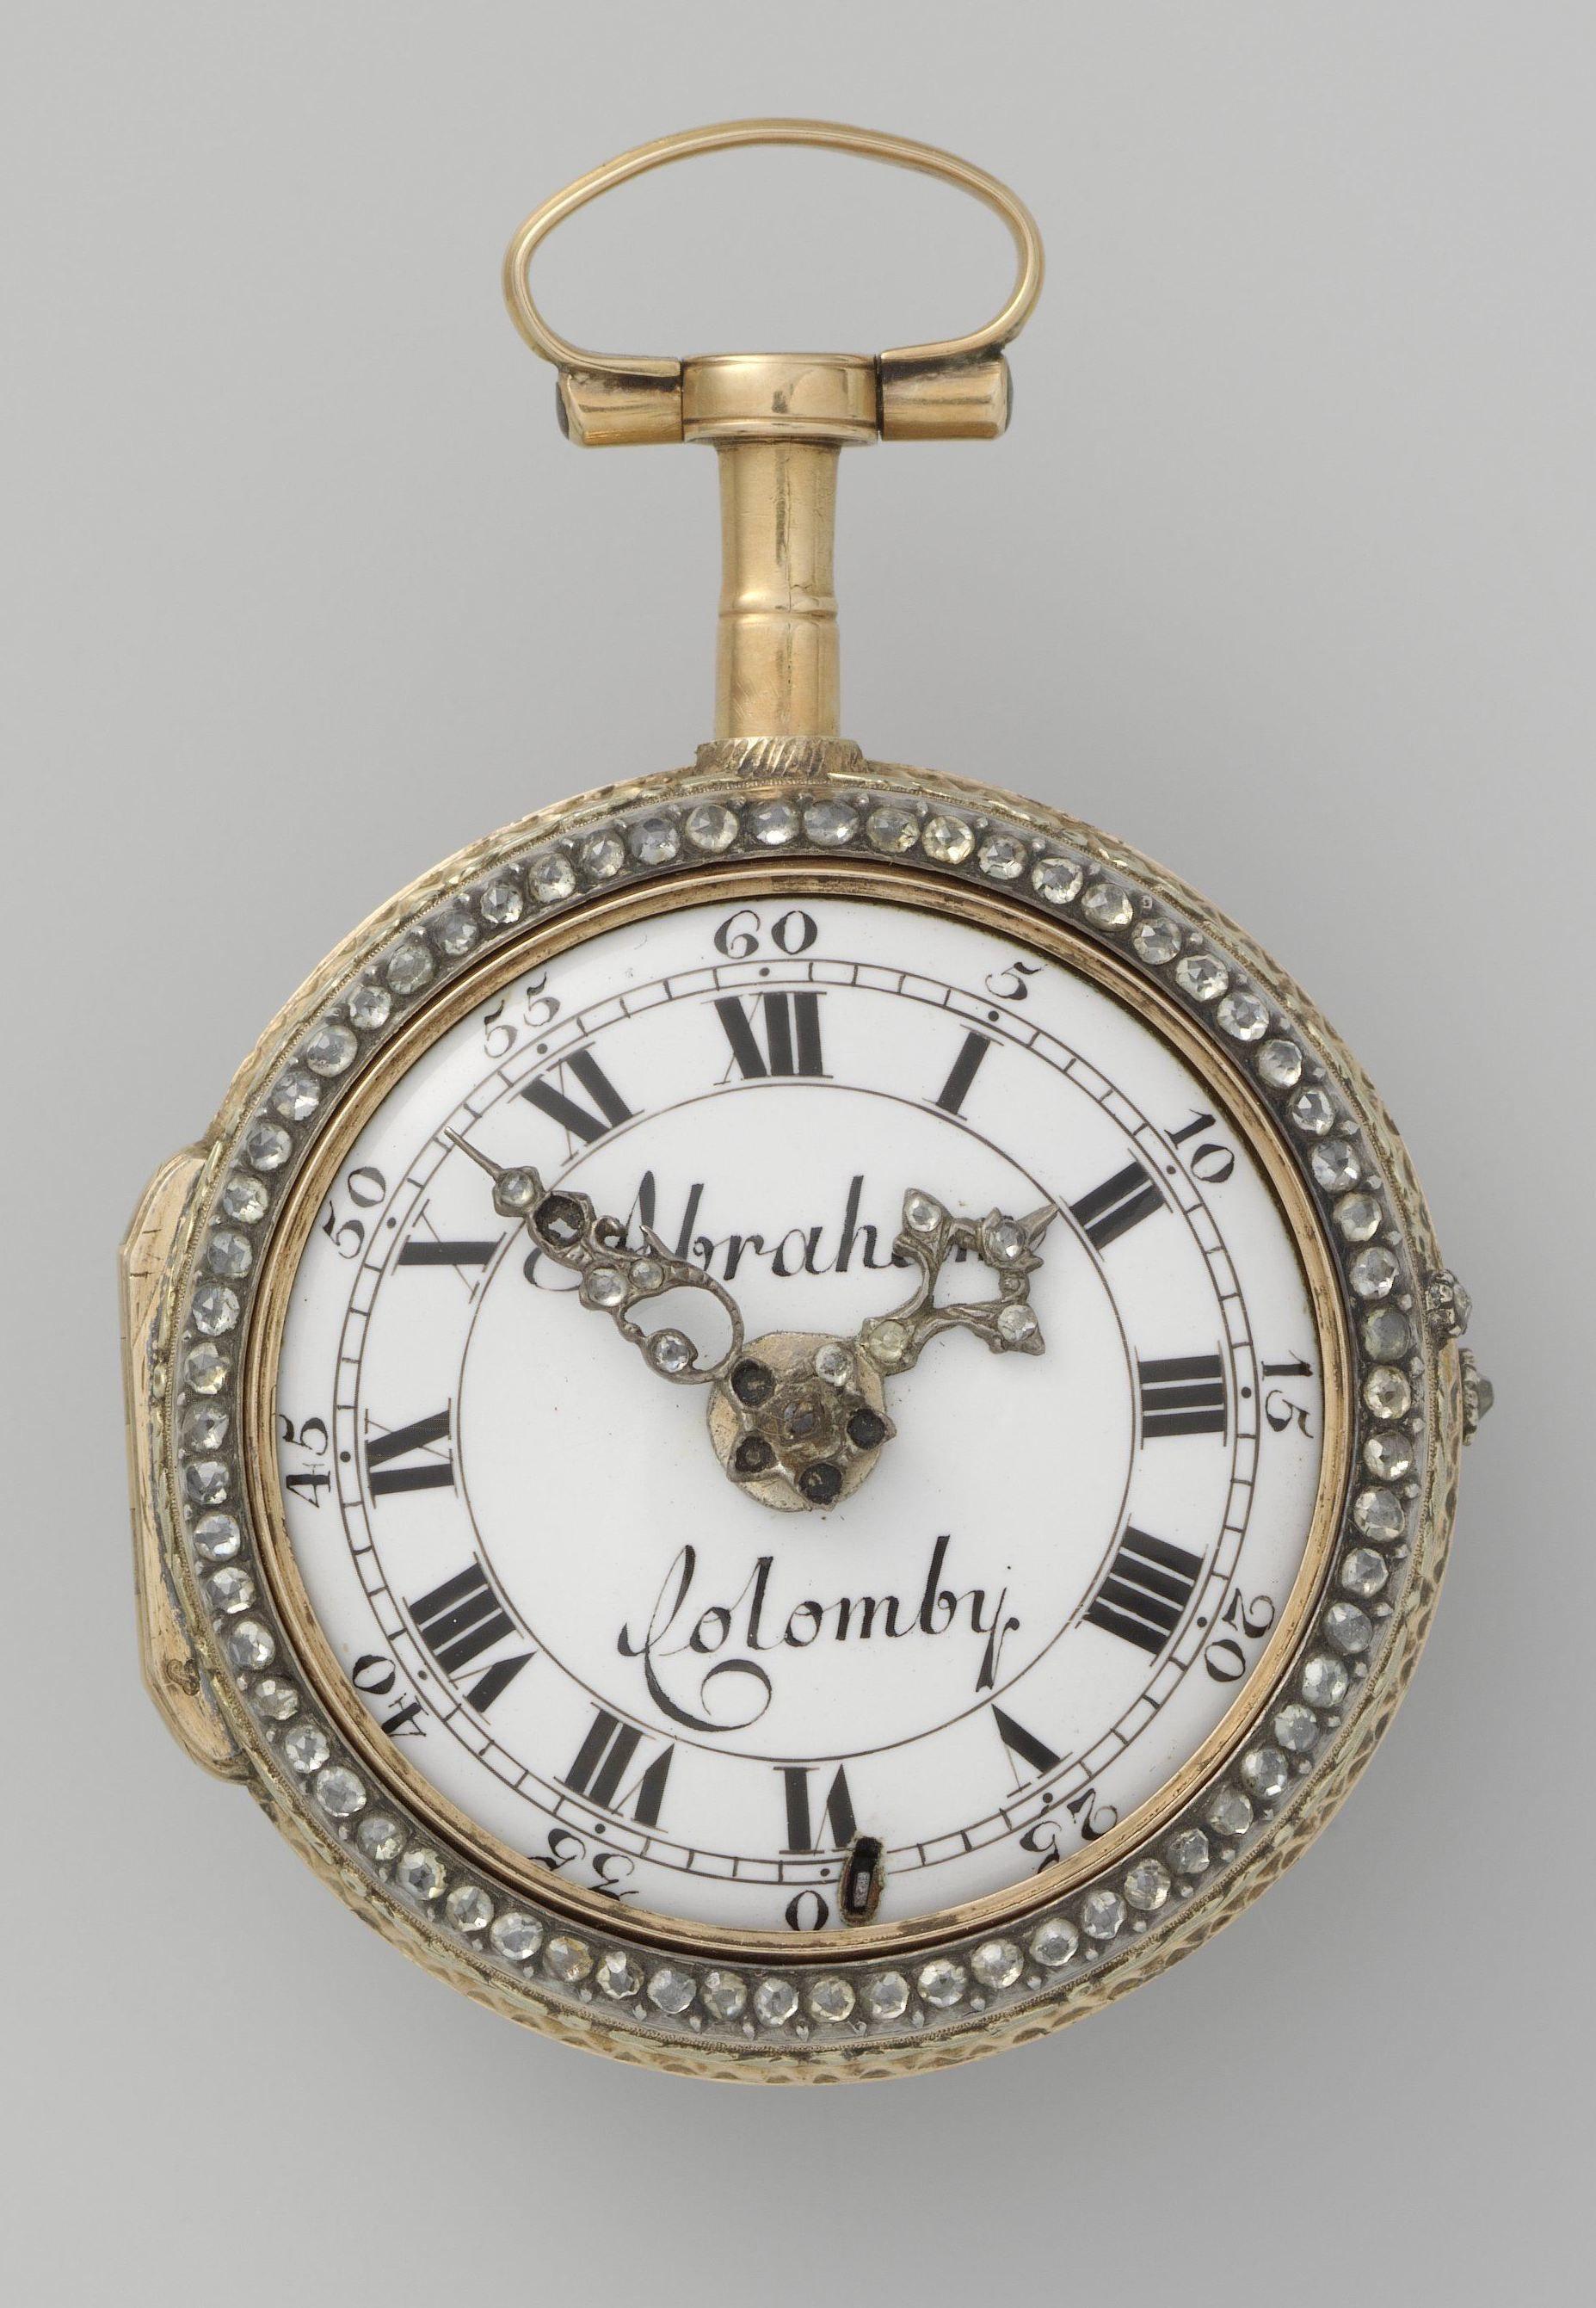 Rijksmuseum Gold Silver Diamond And Enamel Watch Abraham Colomby Switzerland C1750 60